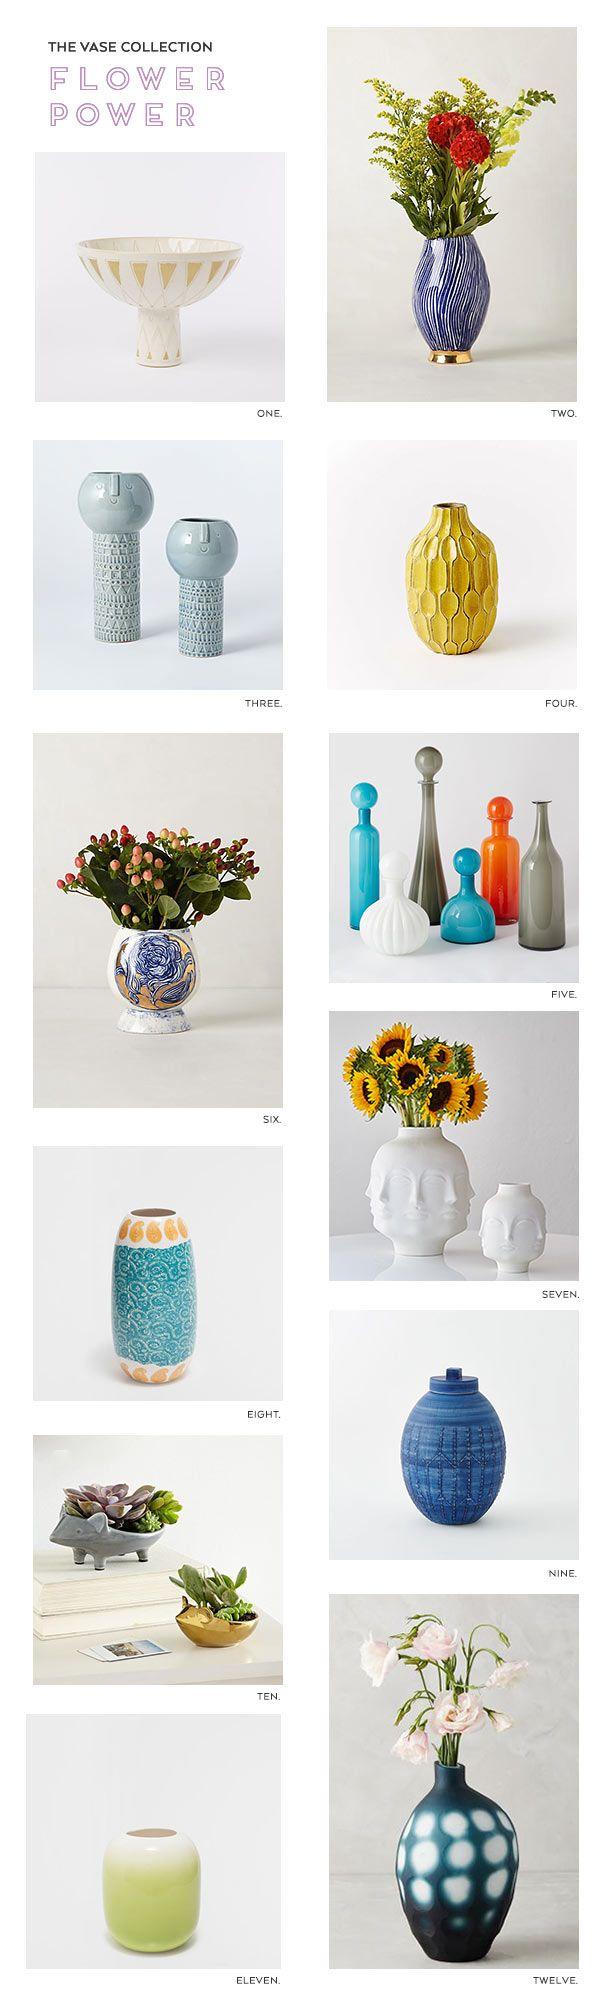 vases1.jpg (610×2002)